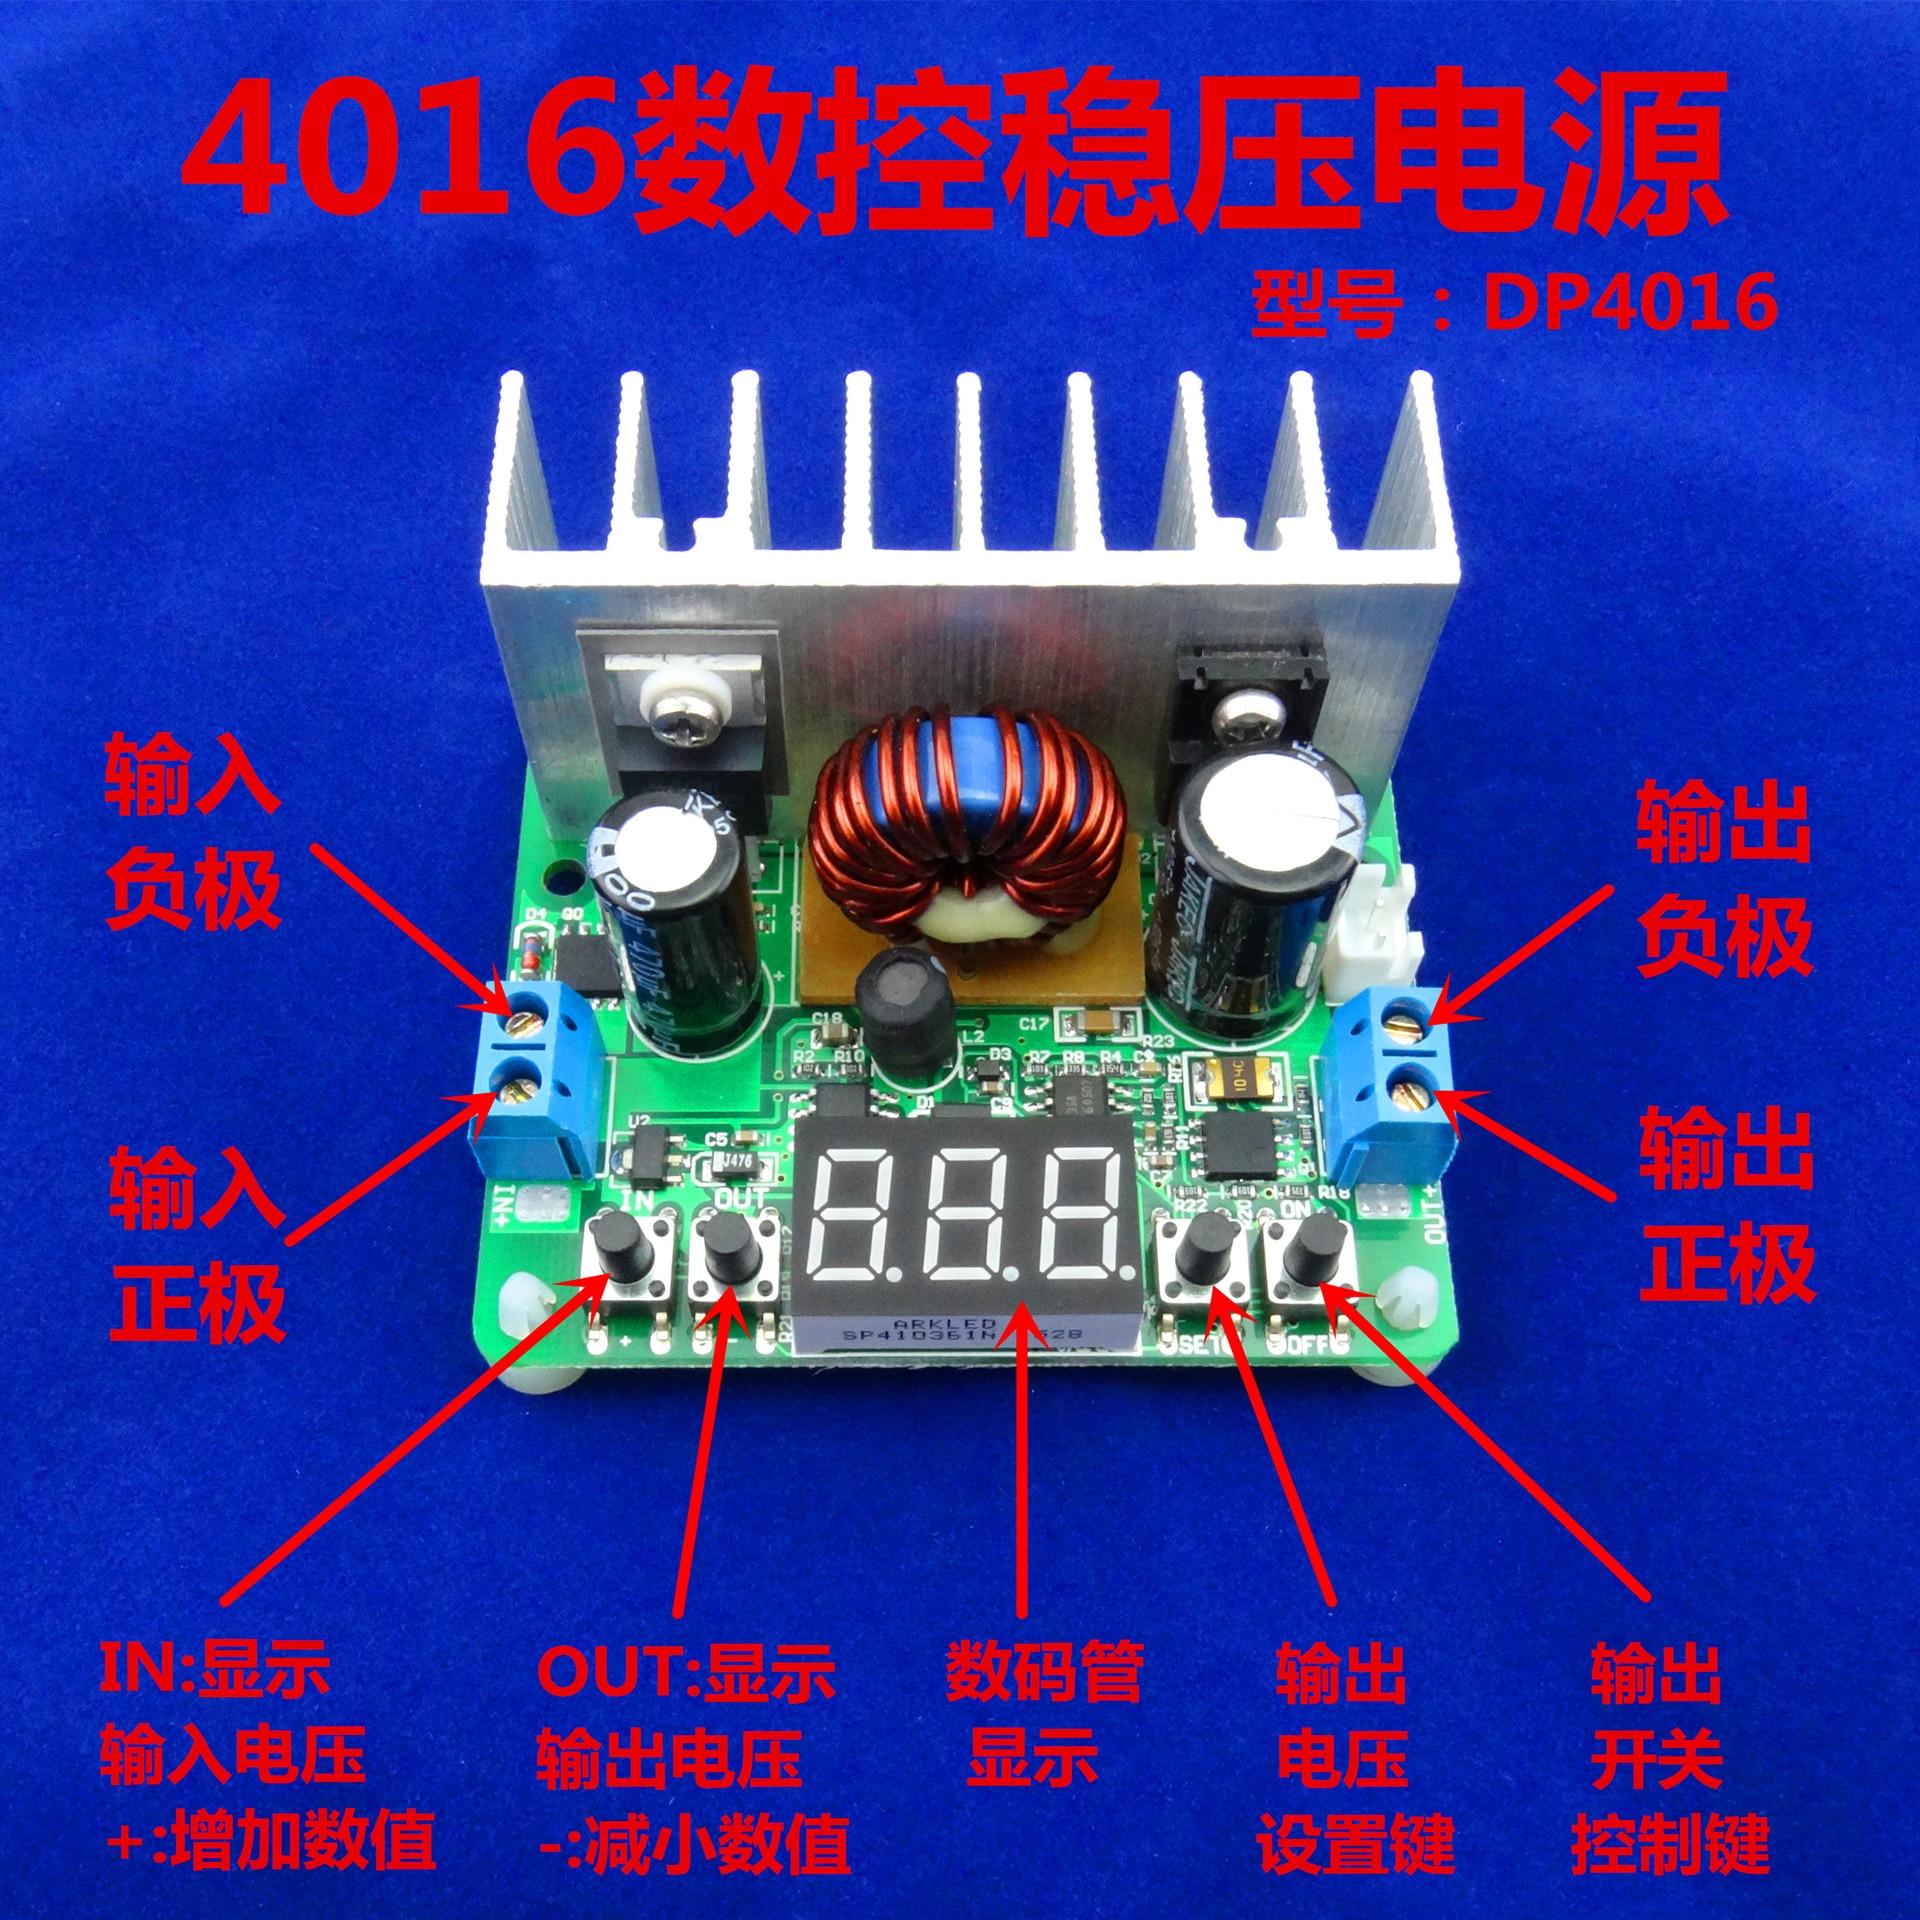 NC DC-DC DC adjustable voltage regulator module integrated voltage meter 8A voltage stabilized power supply<br>